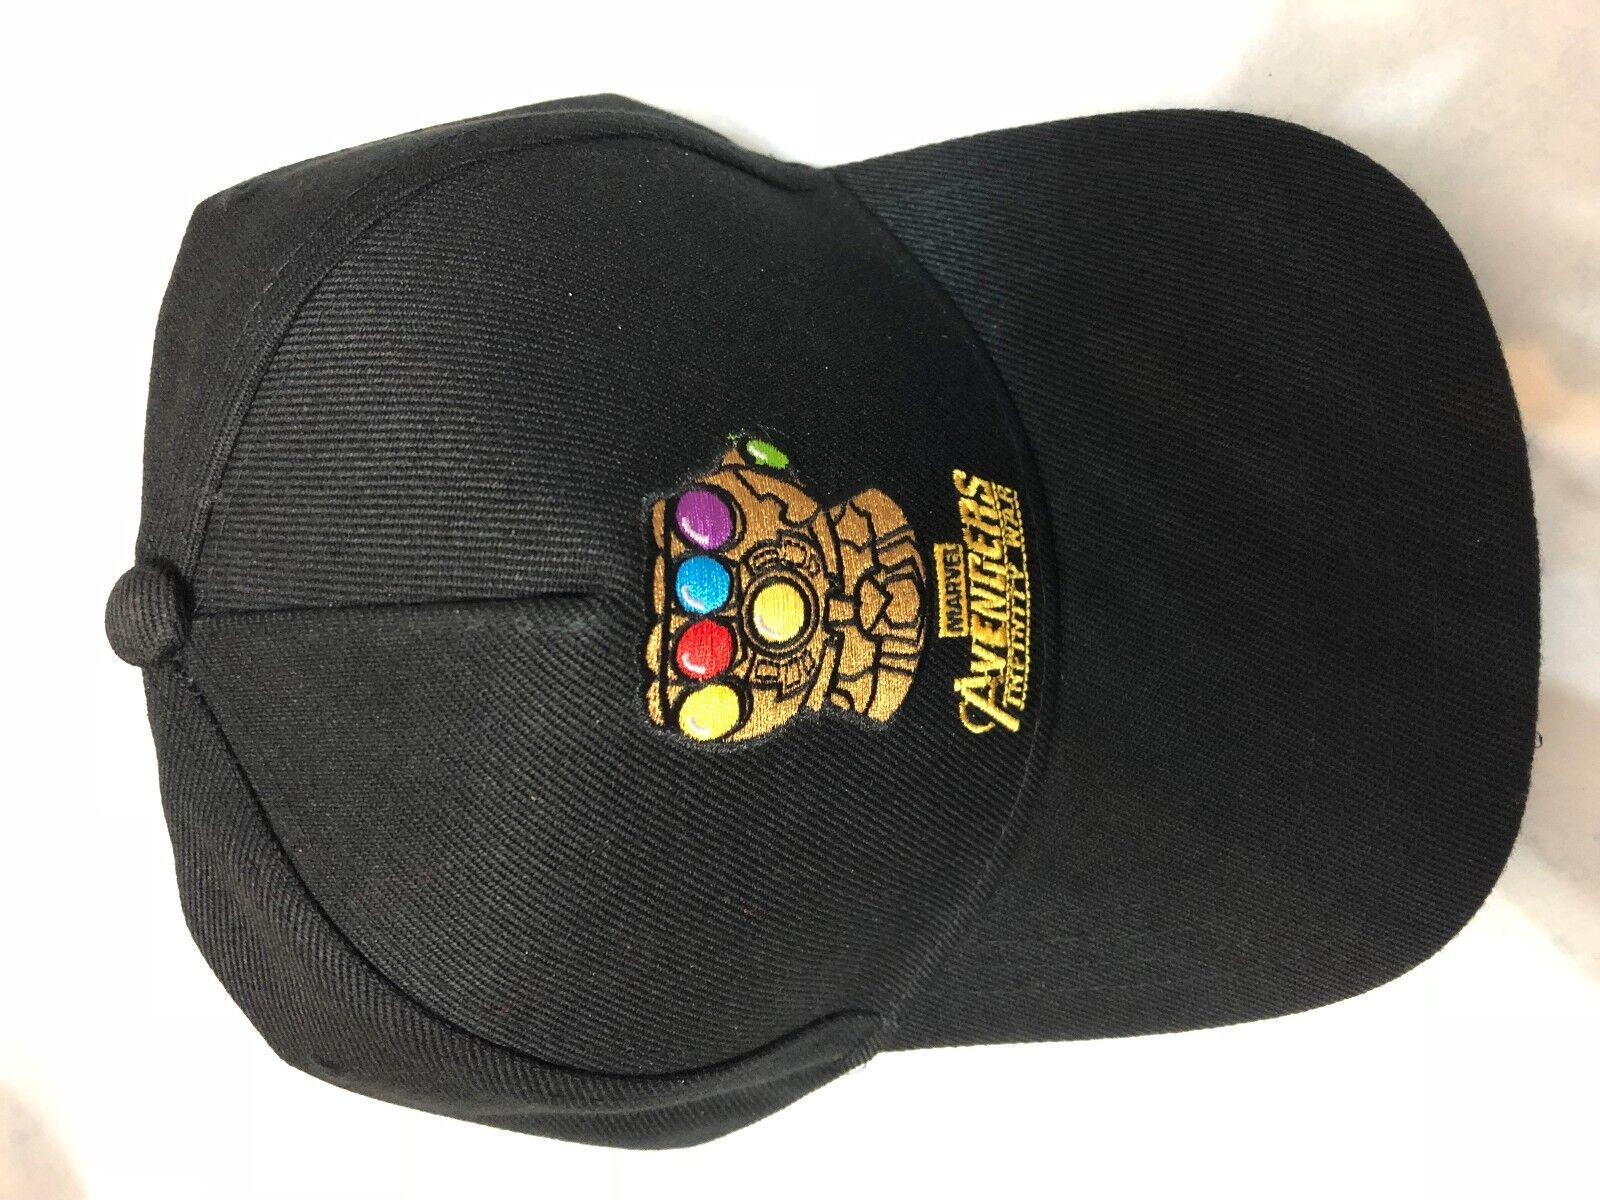 Hot Hot Hot Toys Avengers Infinity War Cap Hat (Type B) 4ac76b